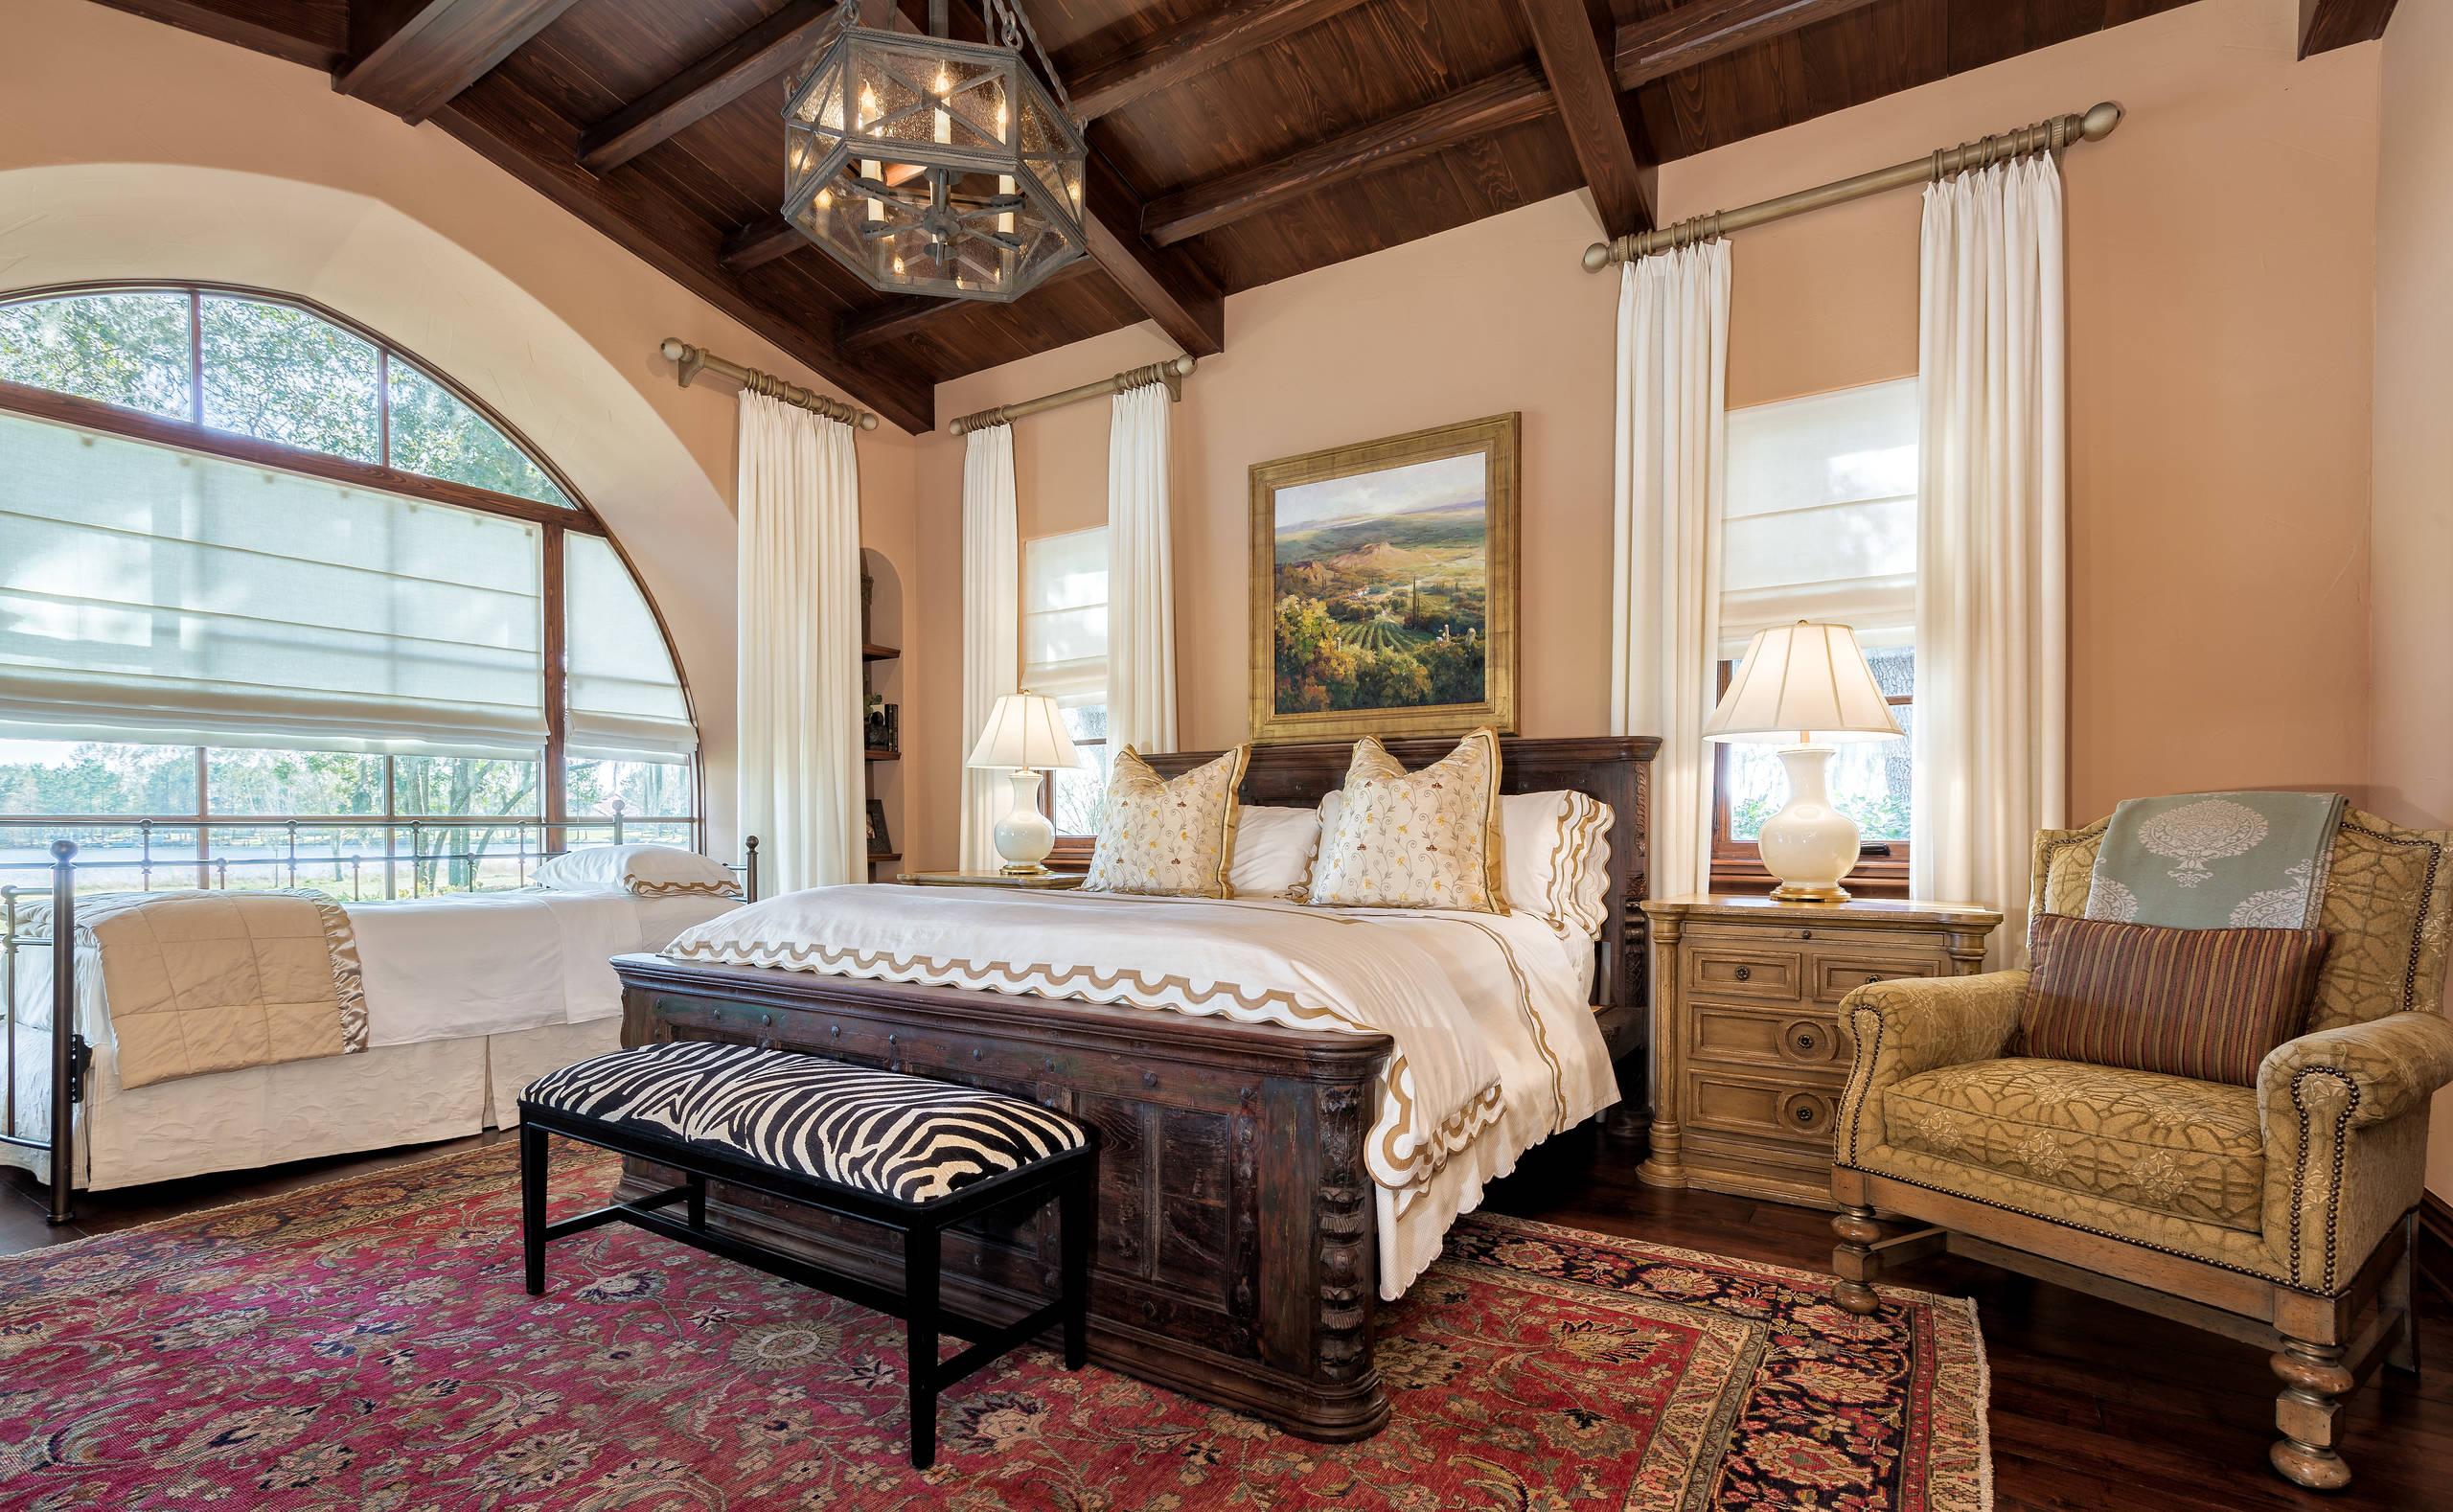 18 Captivating Mediterranean Bedroom Designs You Won't ...